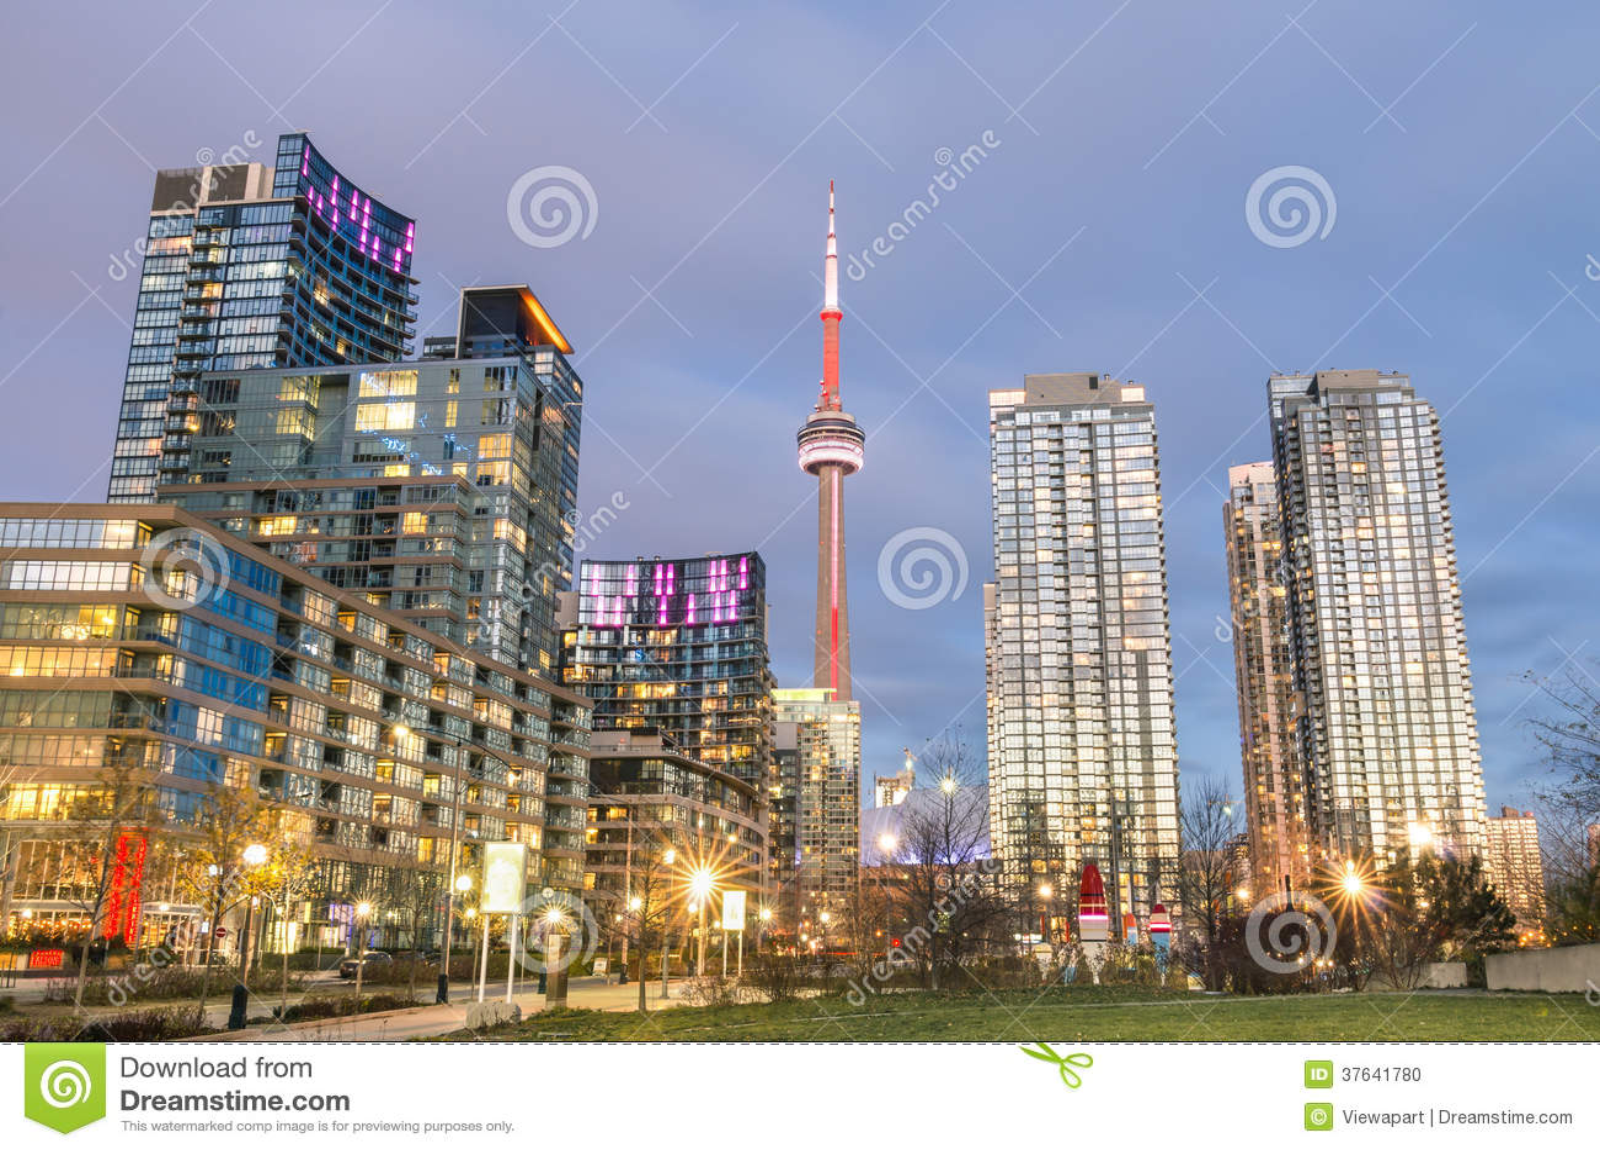 Mizrahi Begins Construction on Canada's Tallest Tower